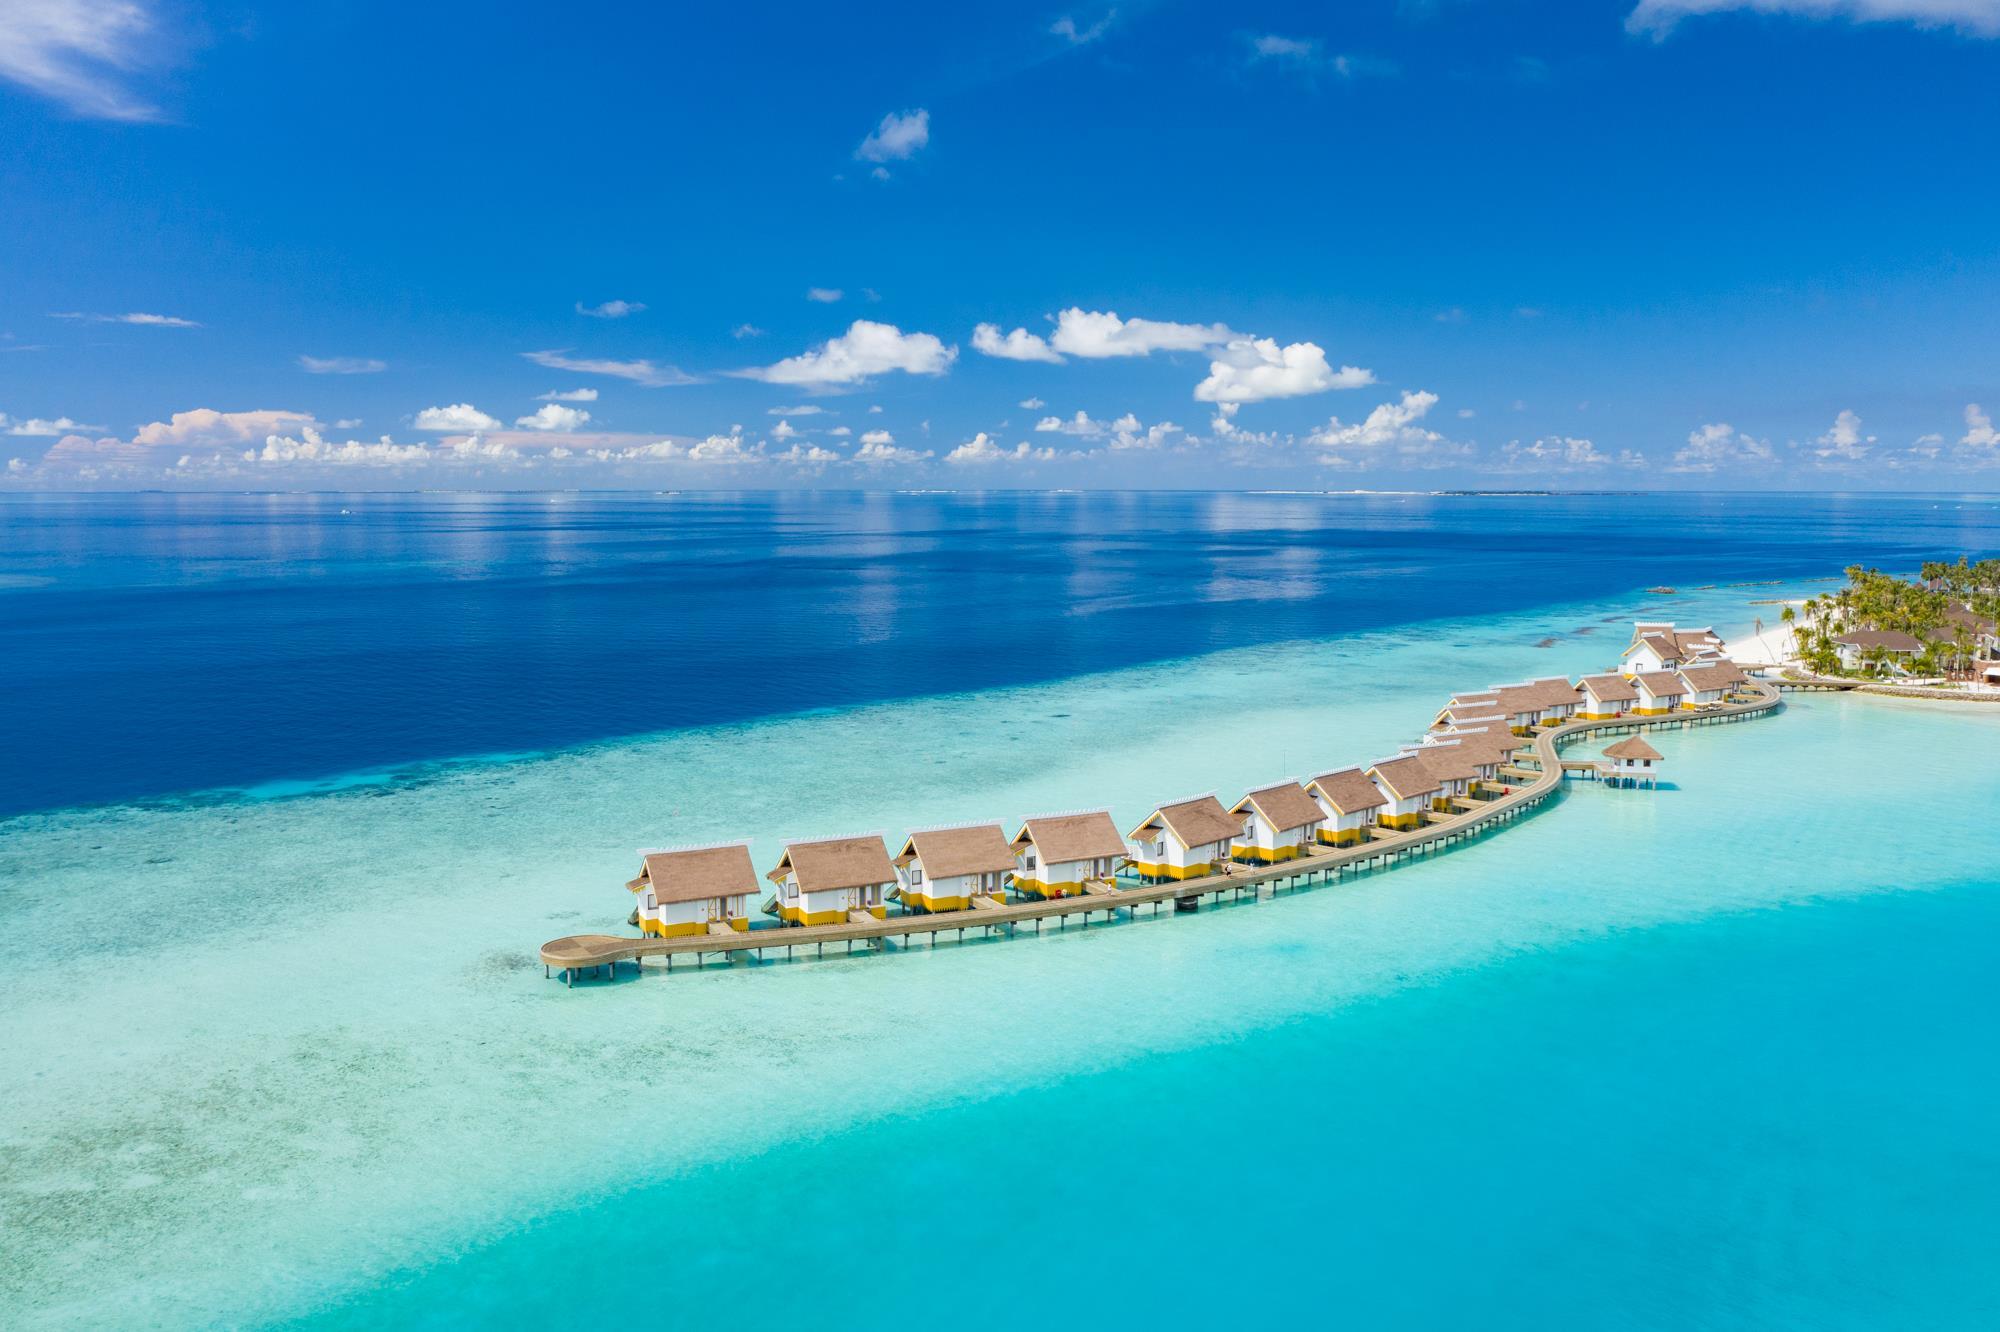 saii-lagoon-maldives-genel-0014